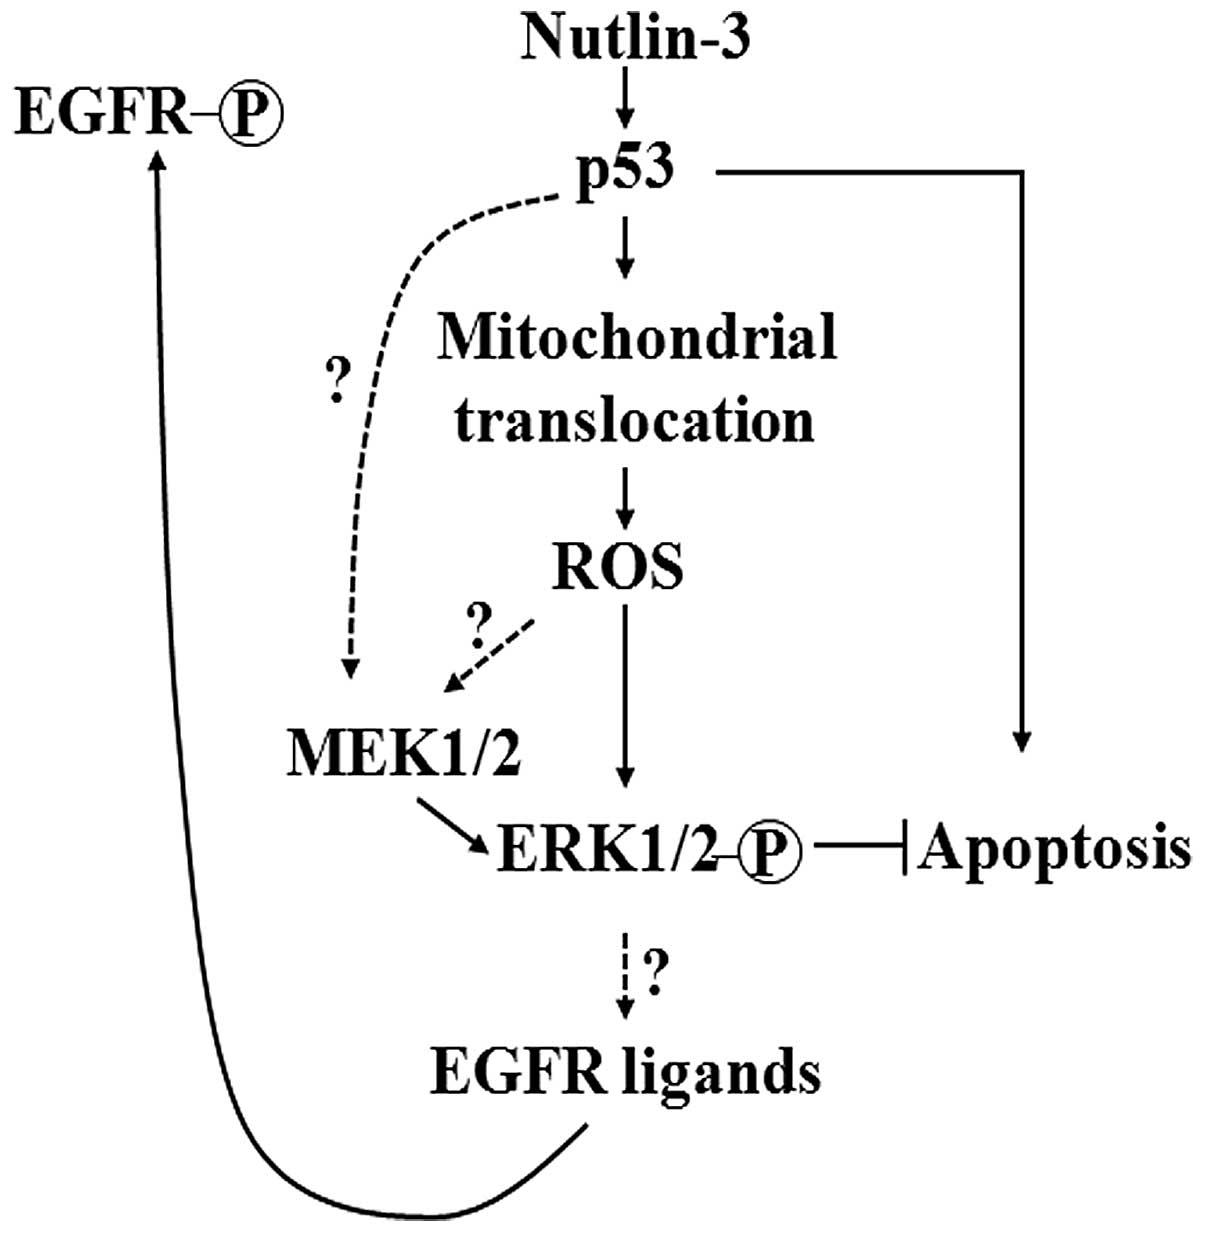 erk1  2 activation mediated by the nutlin u20113 u2011induced